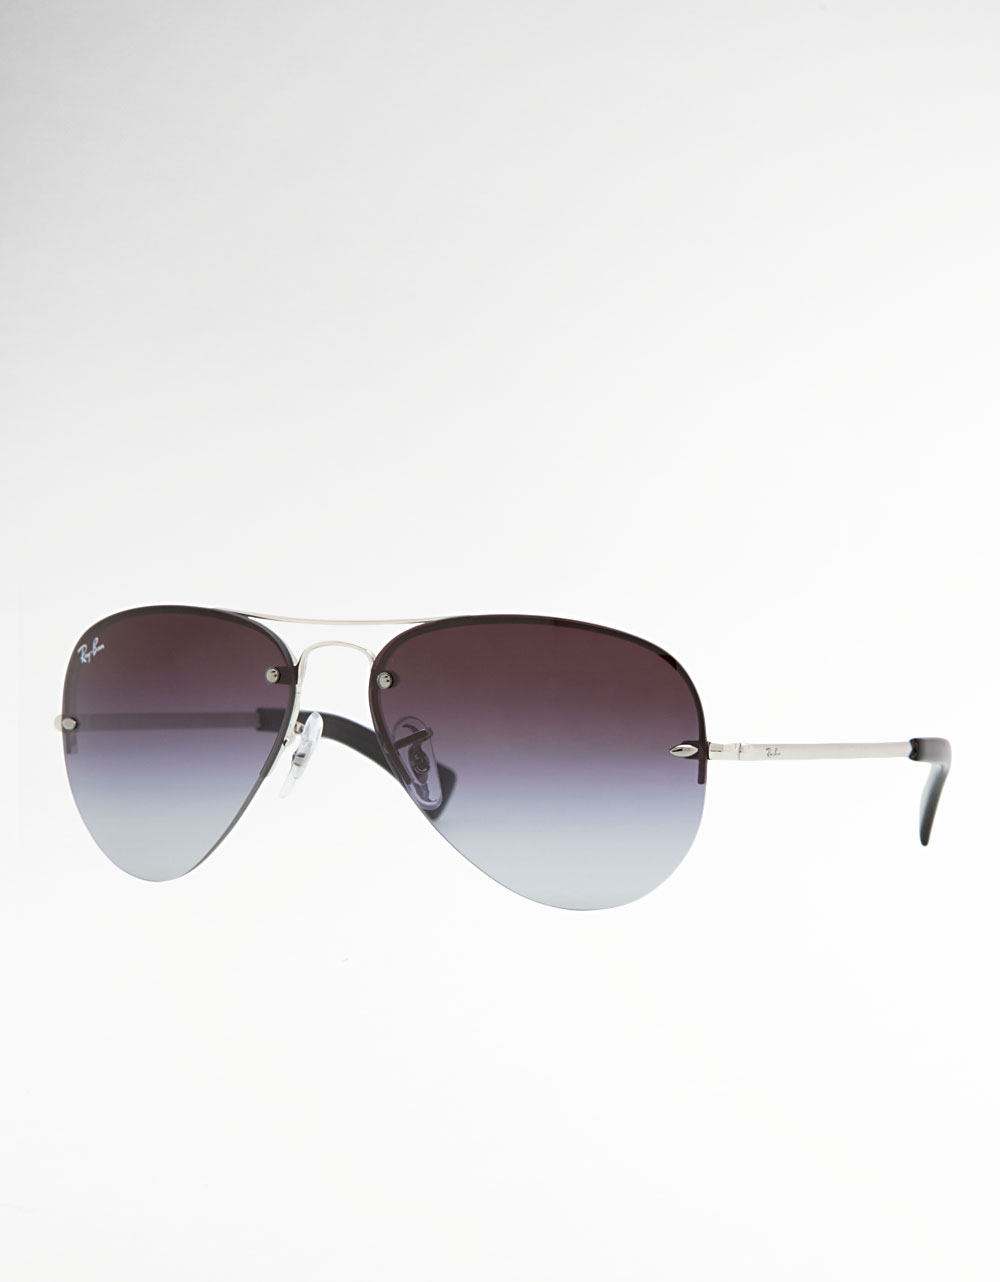 Rimless Glasses Ray Ban : Ray-ban Rimless Aviator Sunglasses in Gray (grad smoke) Lyst